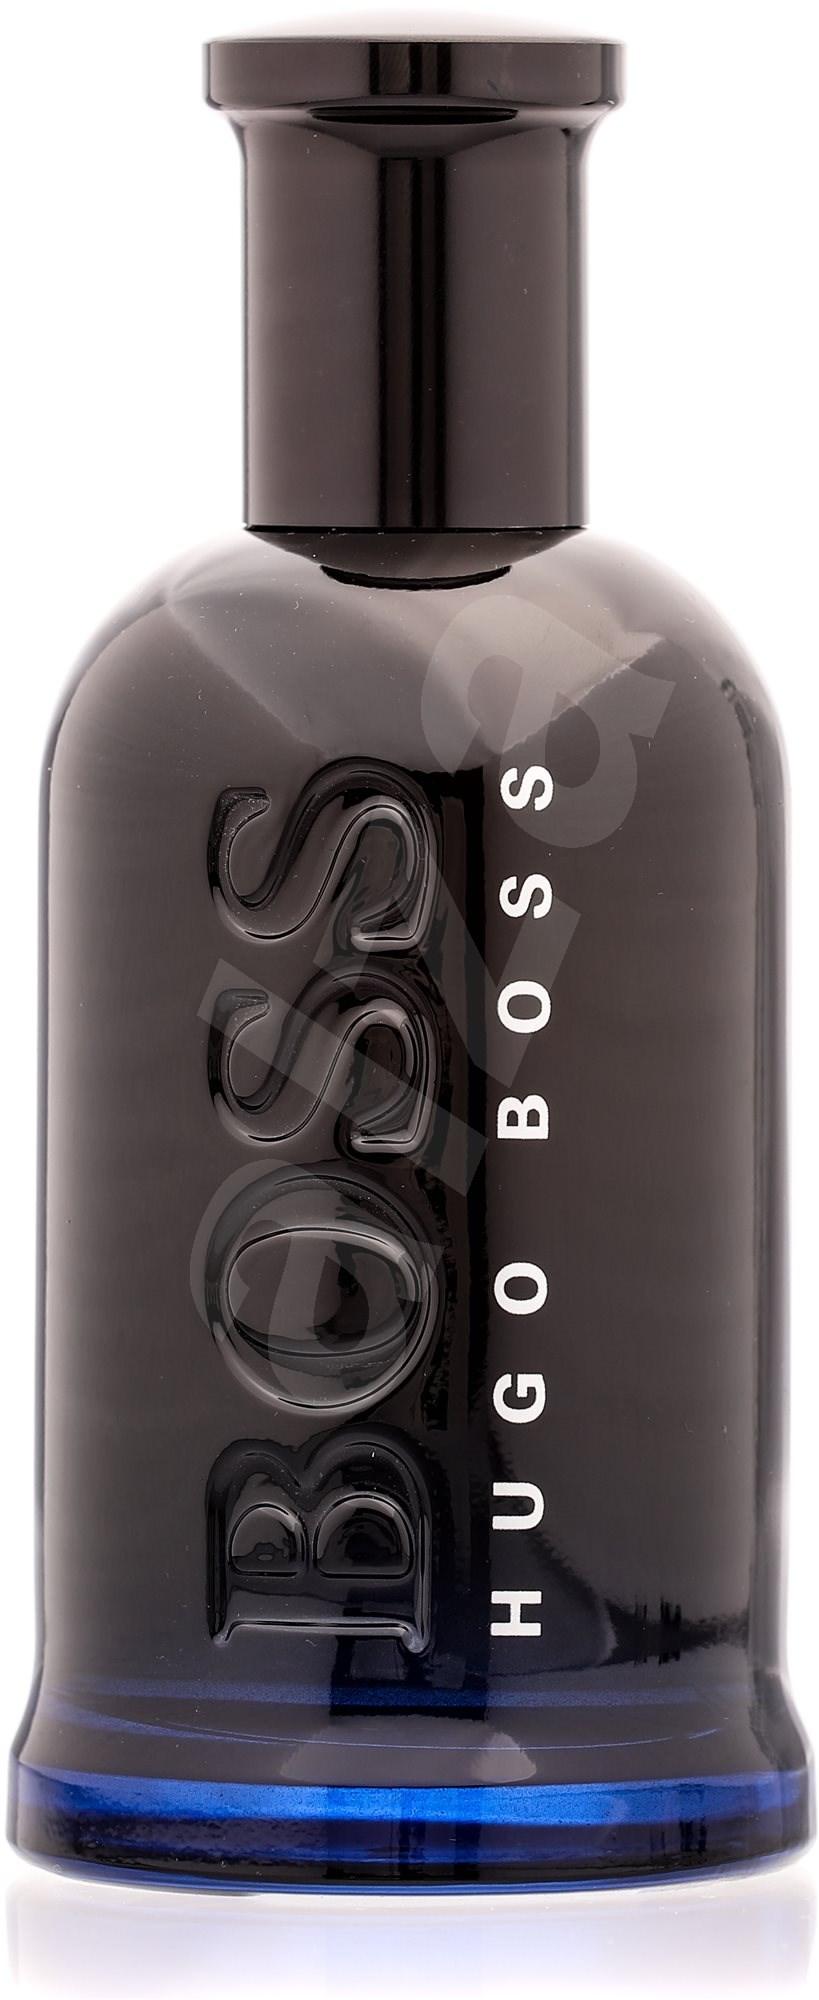 hugo boss boss bottled night 200 ml eau de toilette trendy. Black Bedroom Furniture Sets. Home Design Ideas